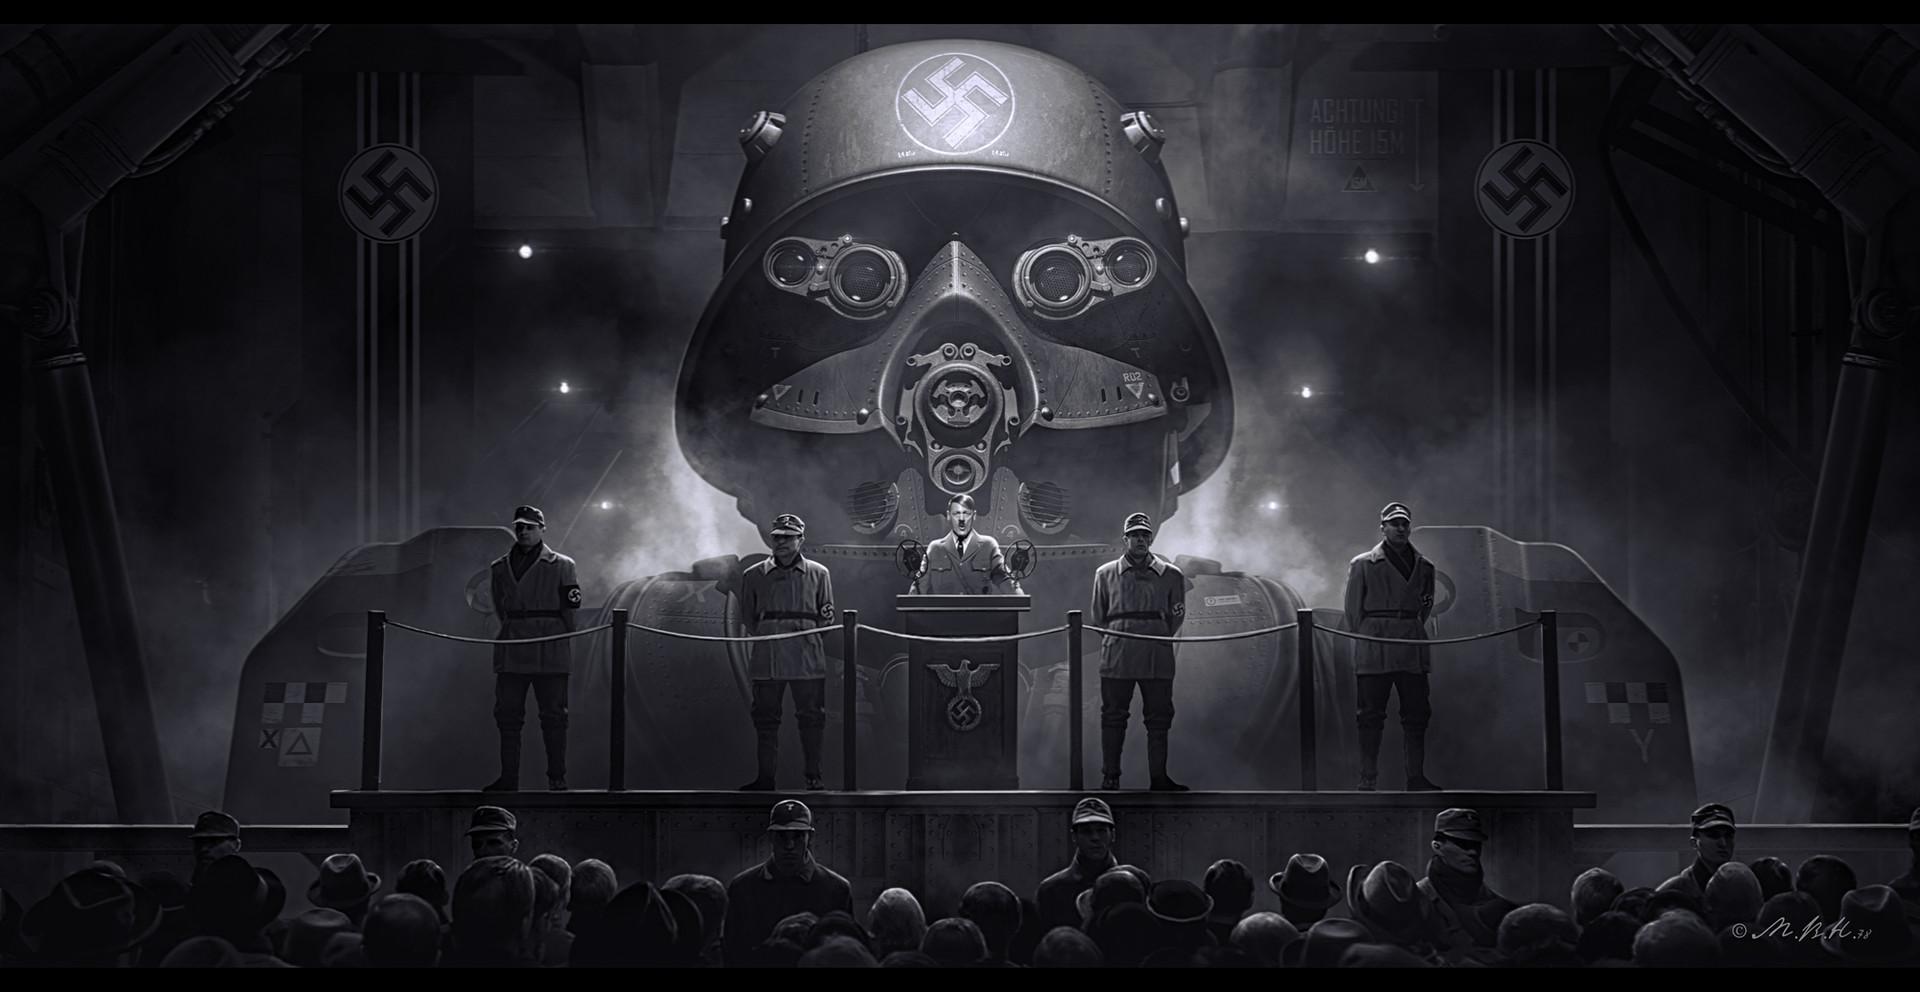 Vladimir manyukhin wolfenstein 2 the new colossus2